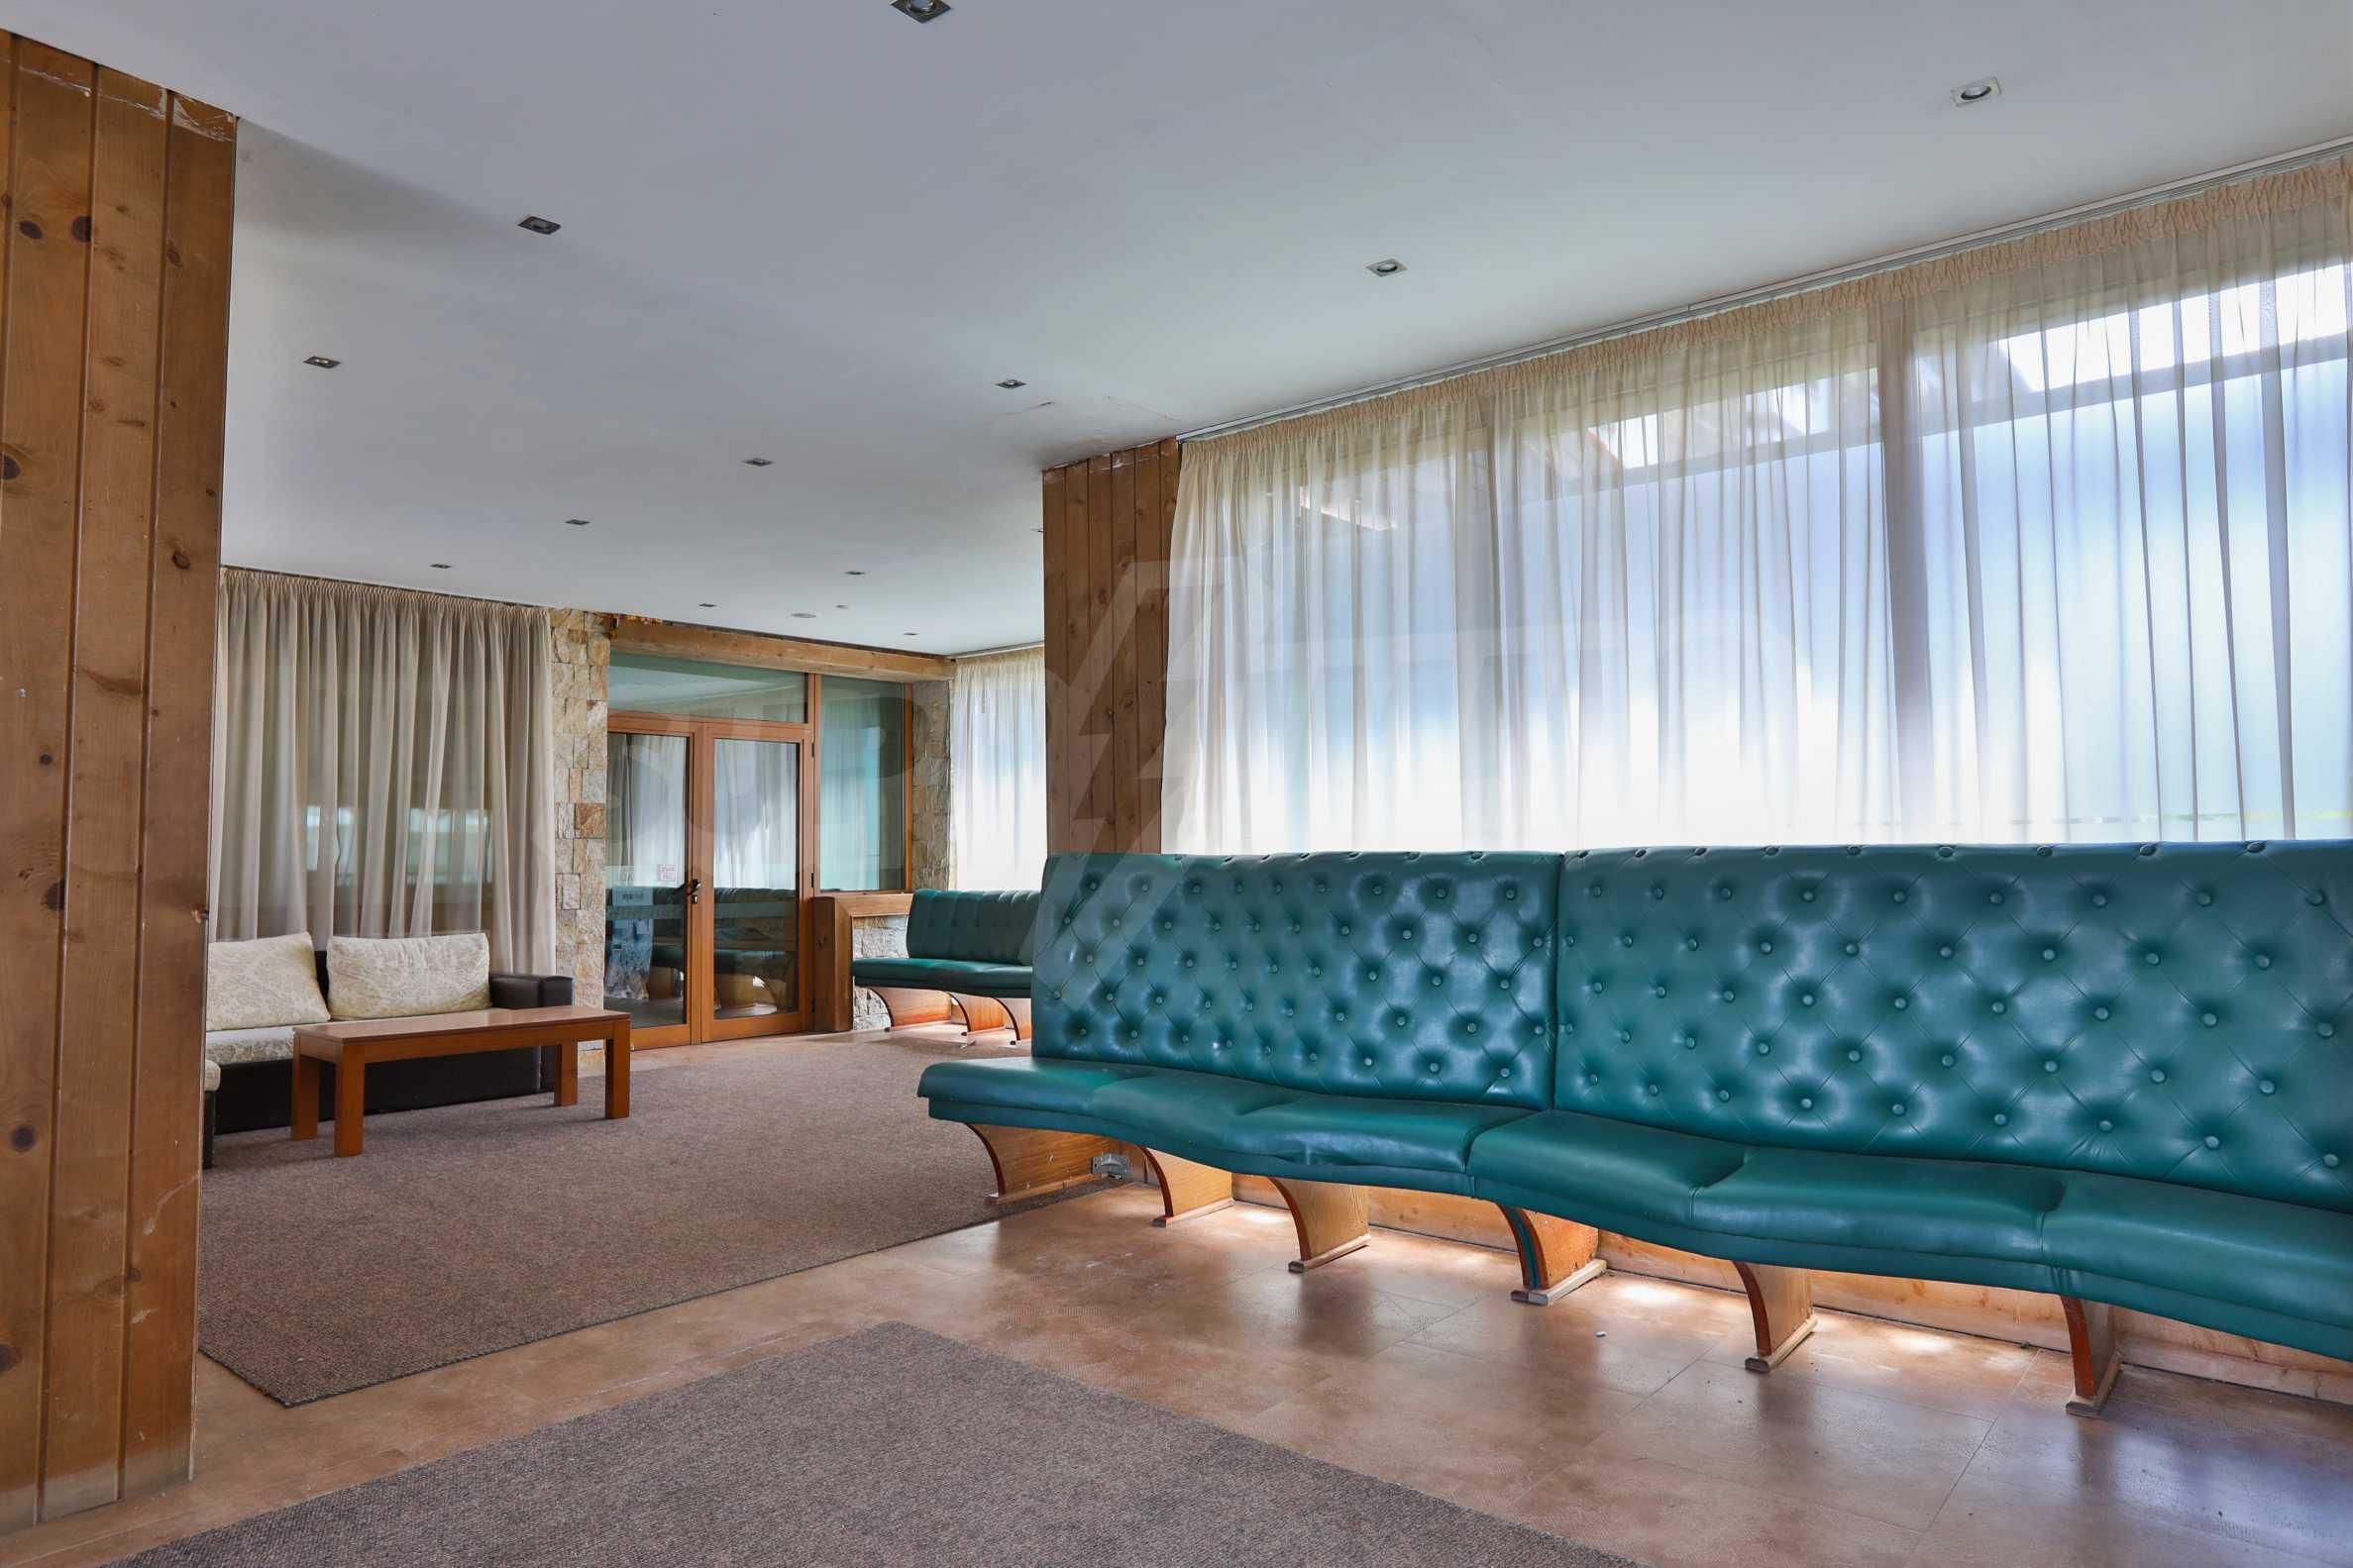 Просторен тристаен апартамент, намиращ се в комплекс Емералд в Банско 12